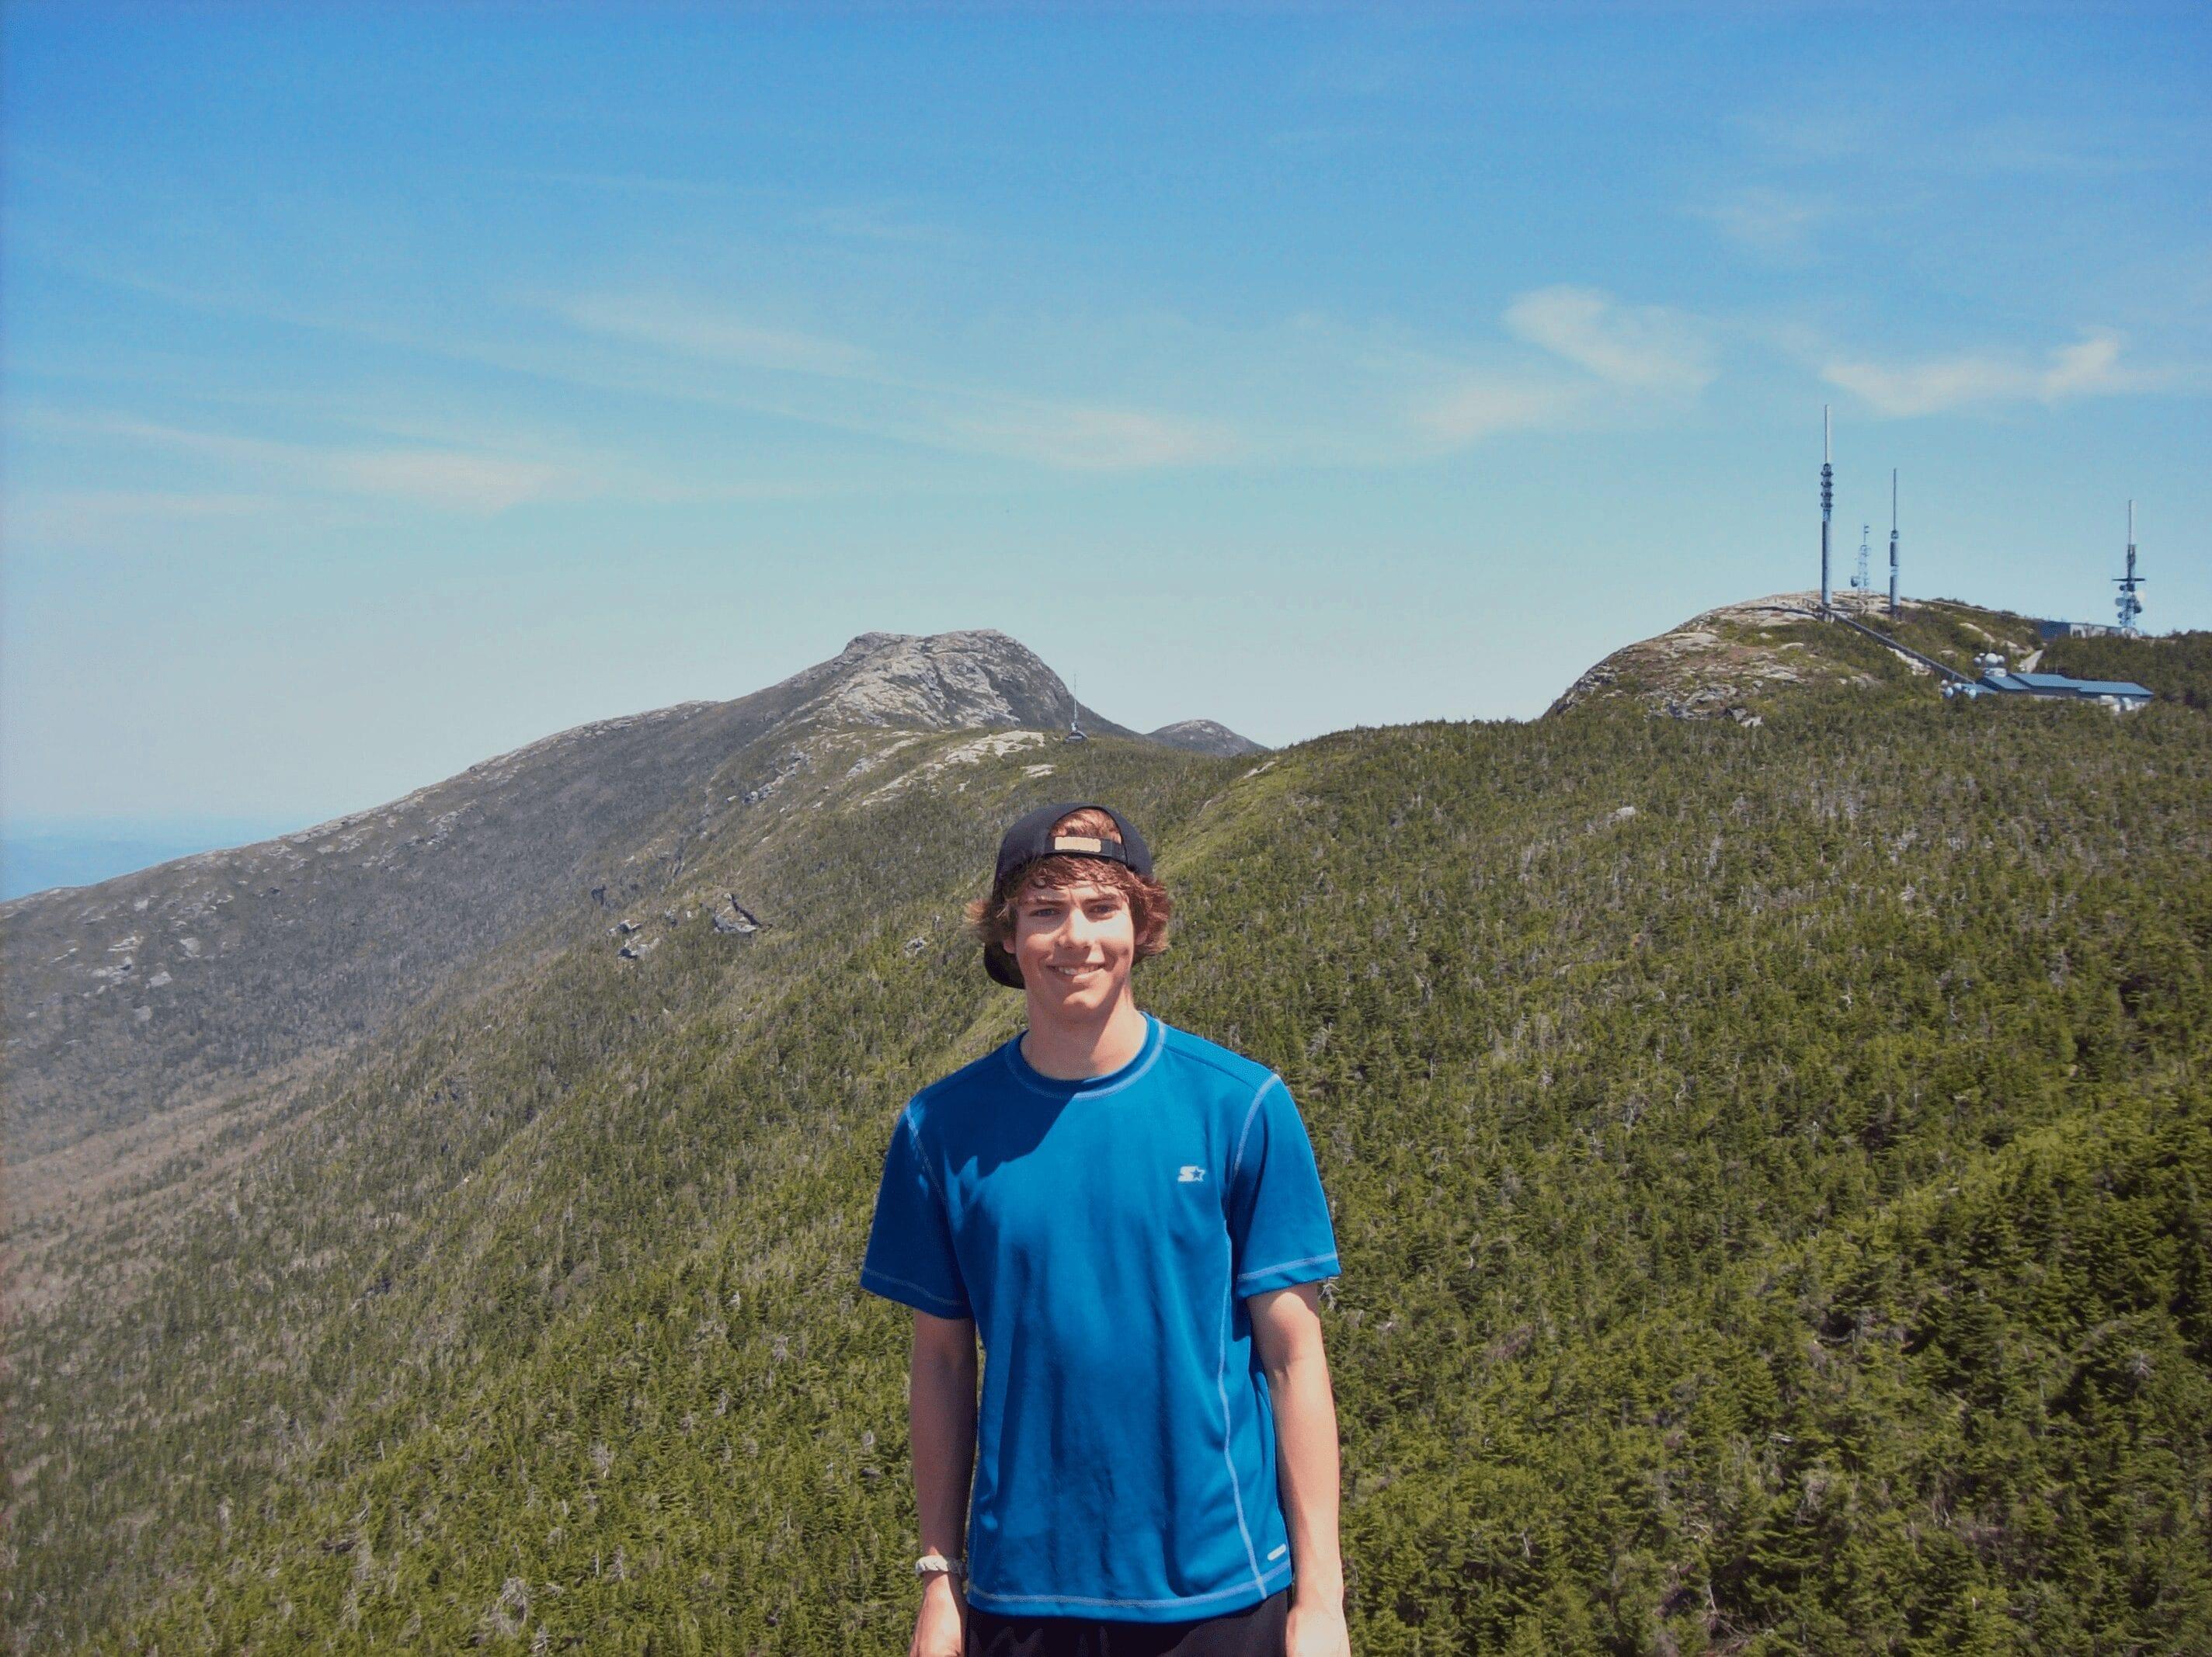 A teenage boy hiking.